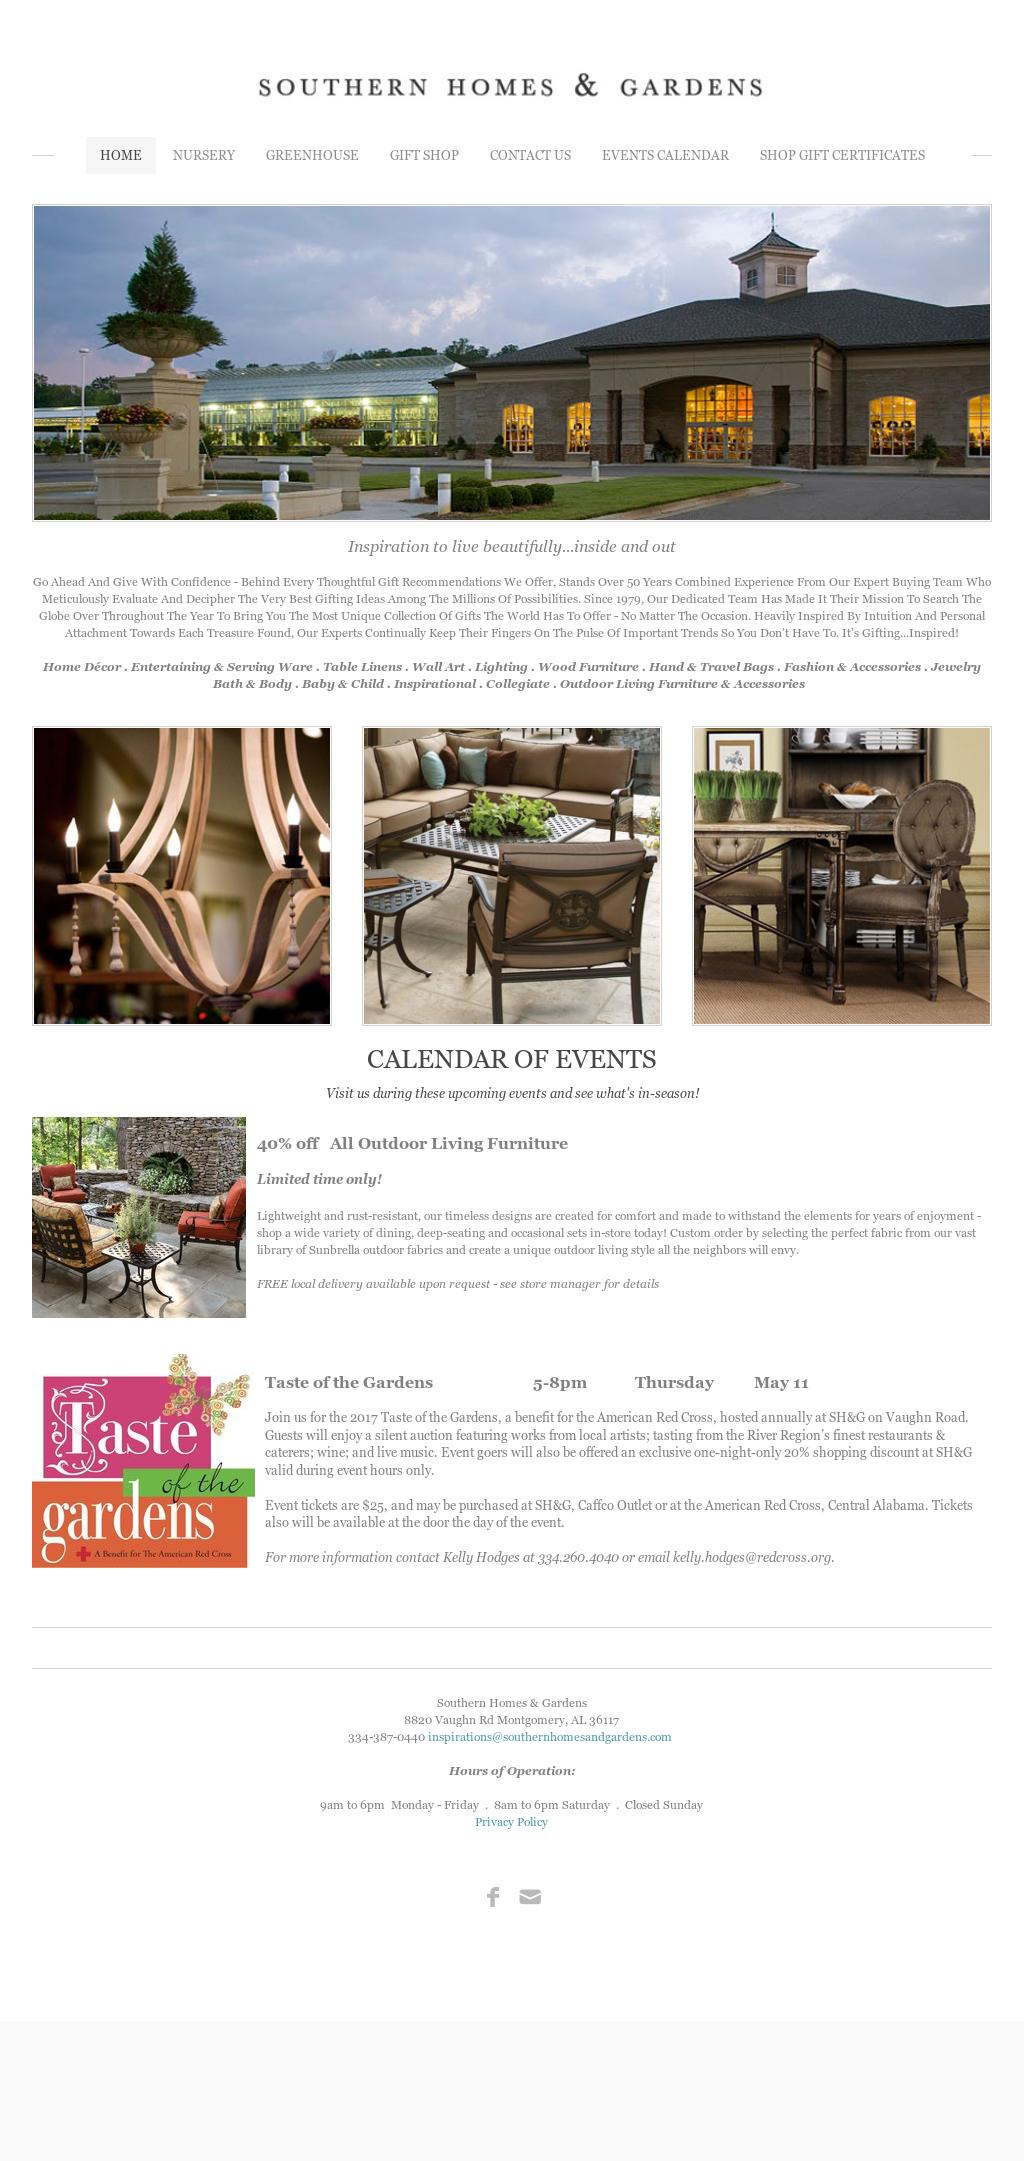 Southern homes gardens montgomery al 36117 garden - Southern homes and gardens montgomery al ...